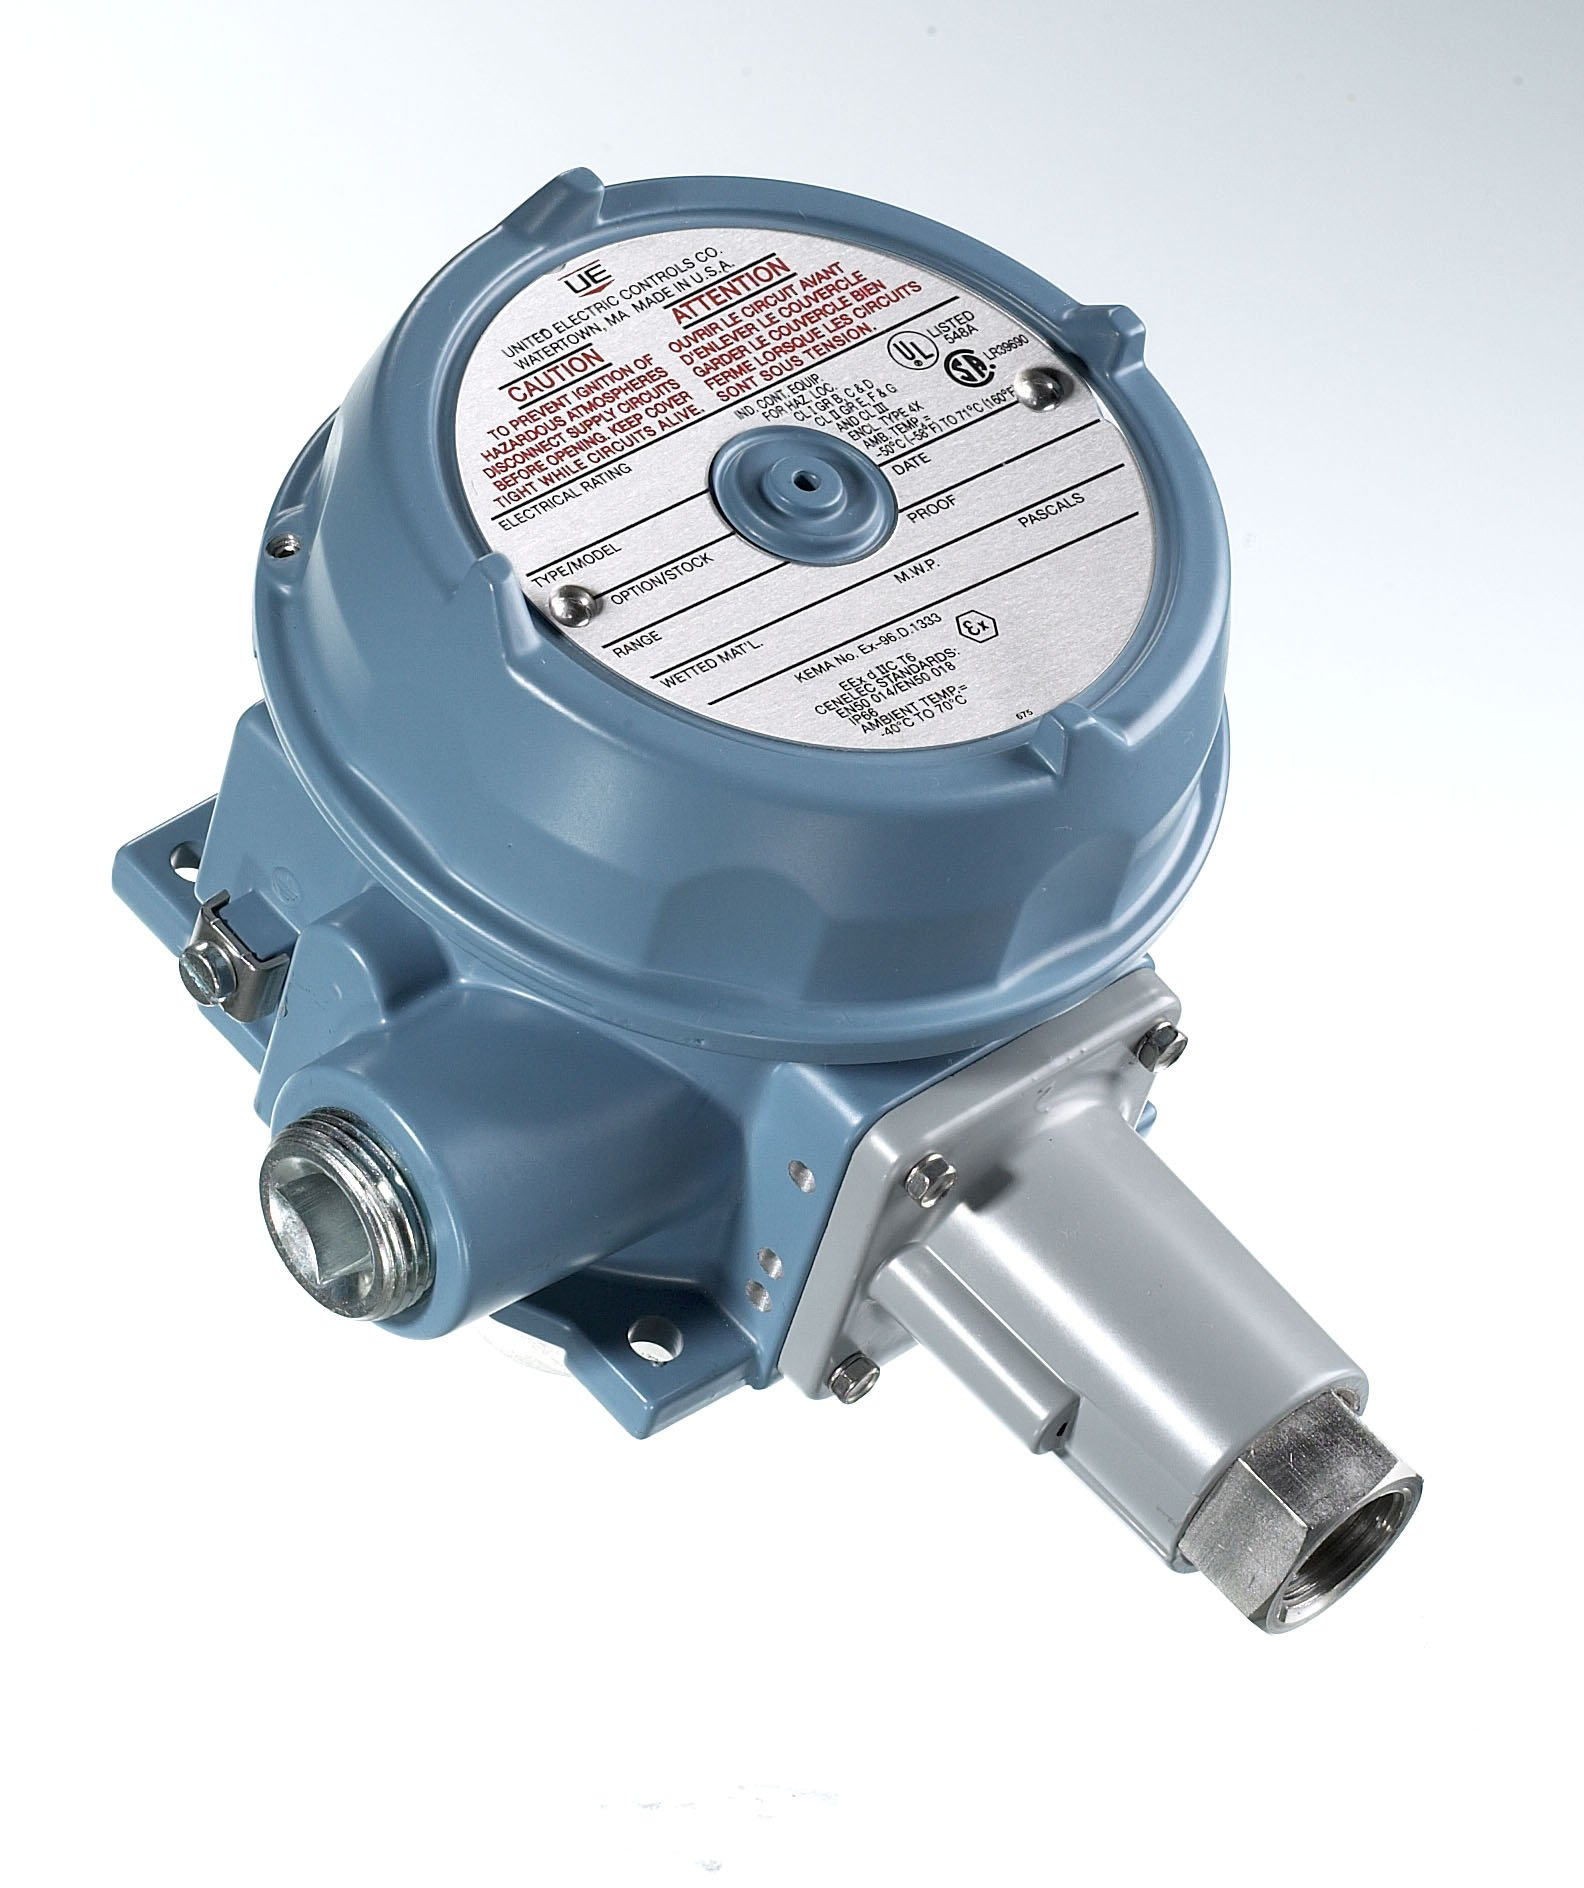 United Electric (UE) 120 Series Temperature Switch B121-13272